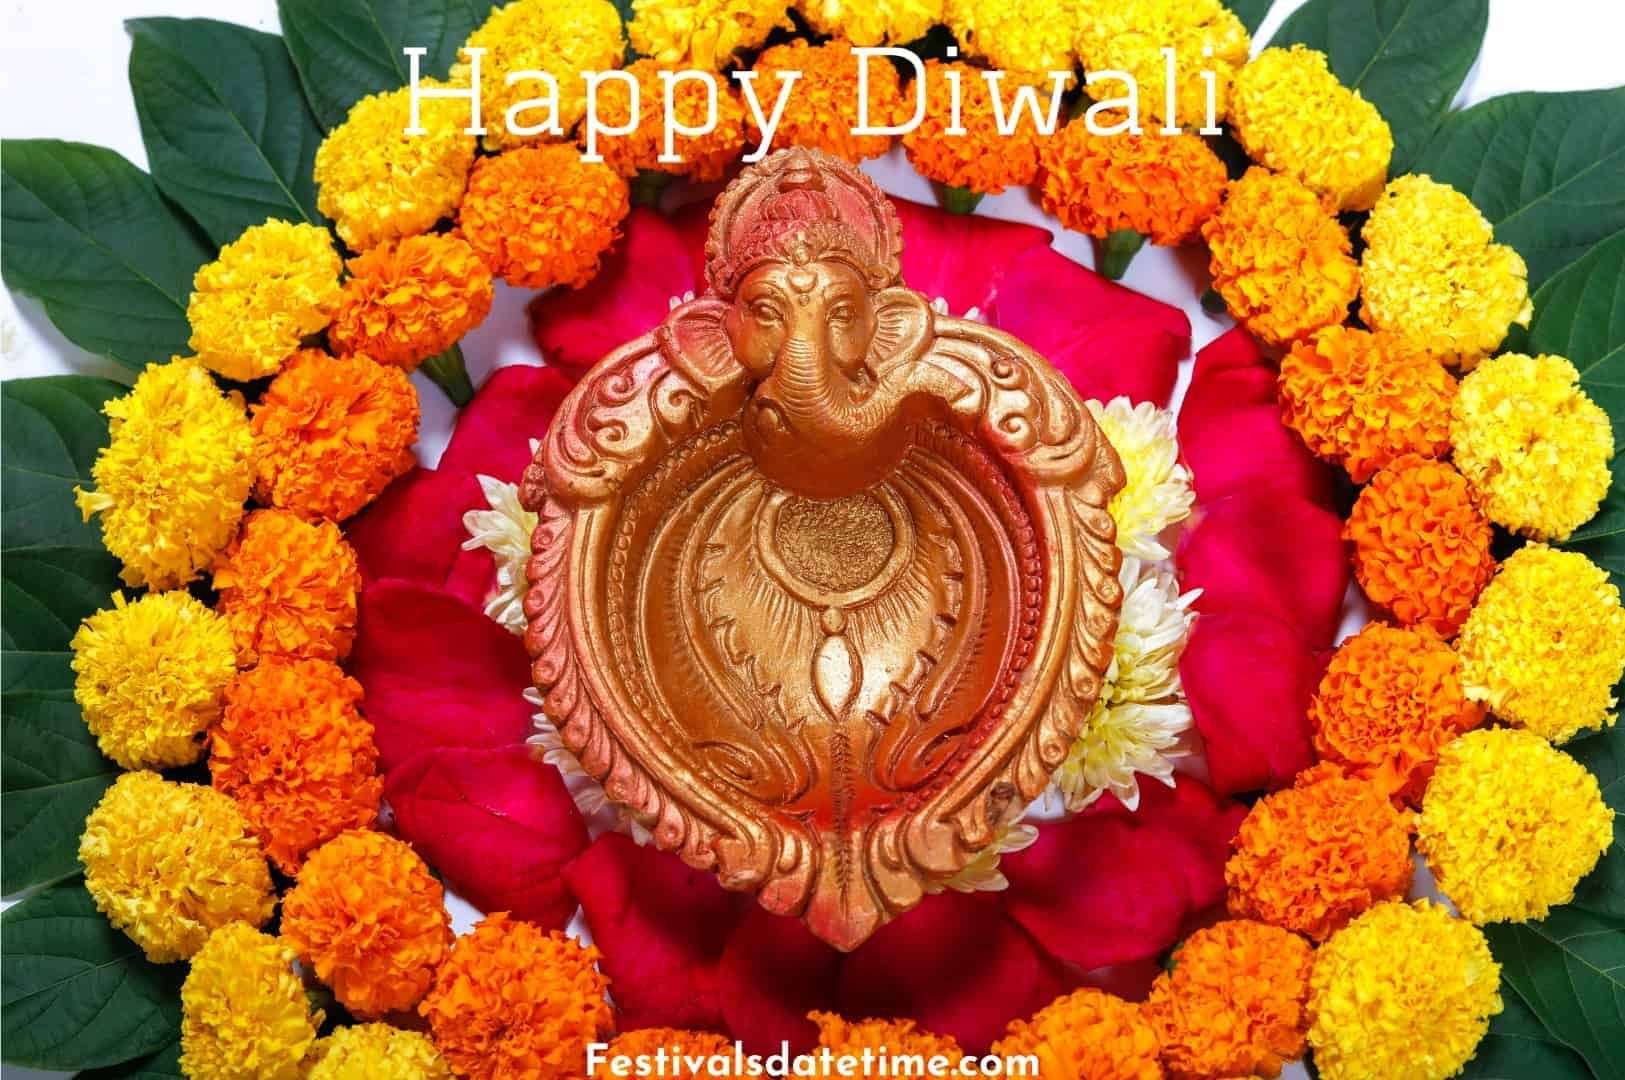 Diwali Rangoli Flower Images in 2020 Diwali images